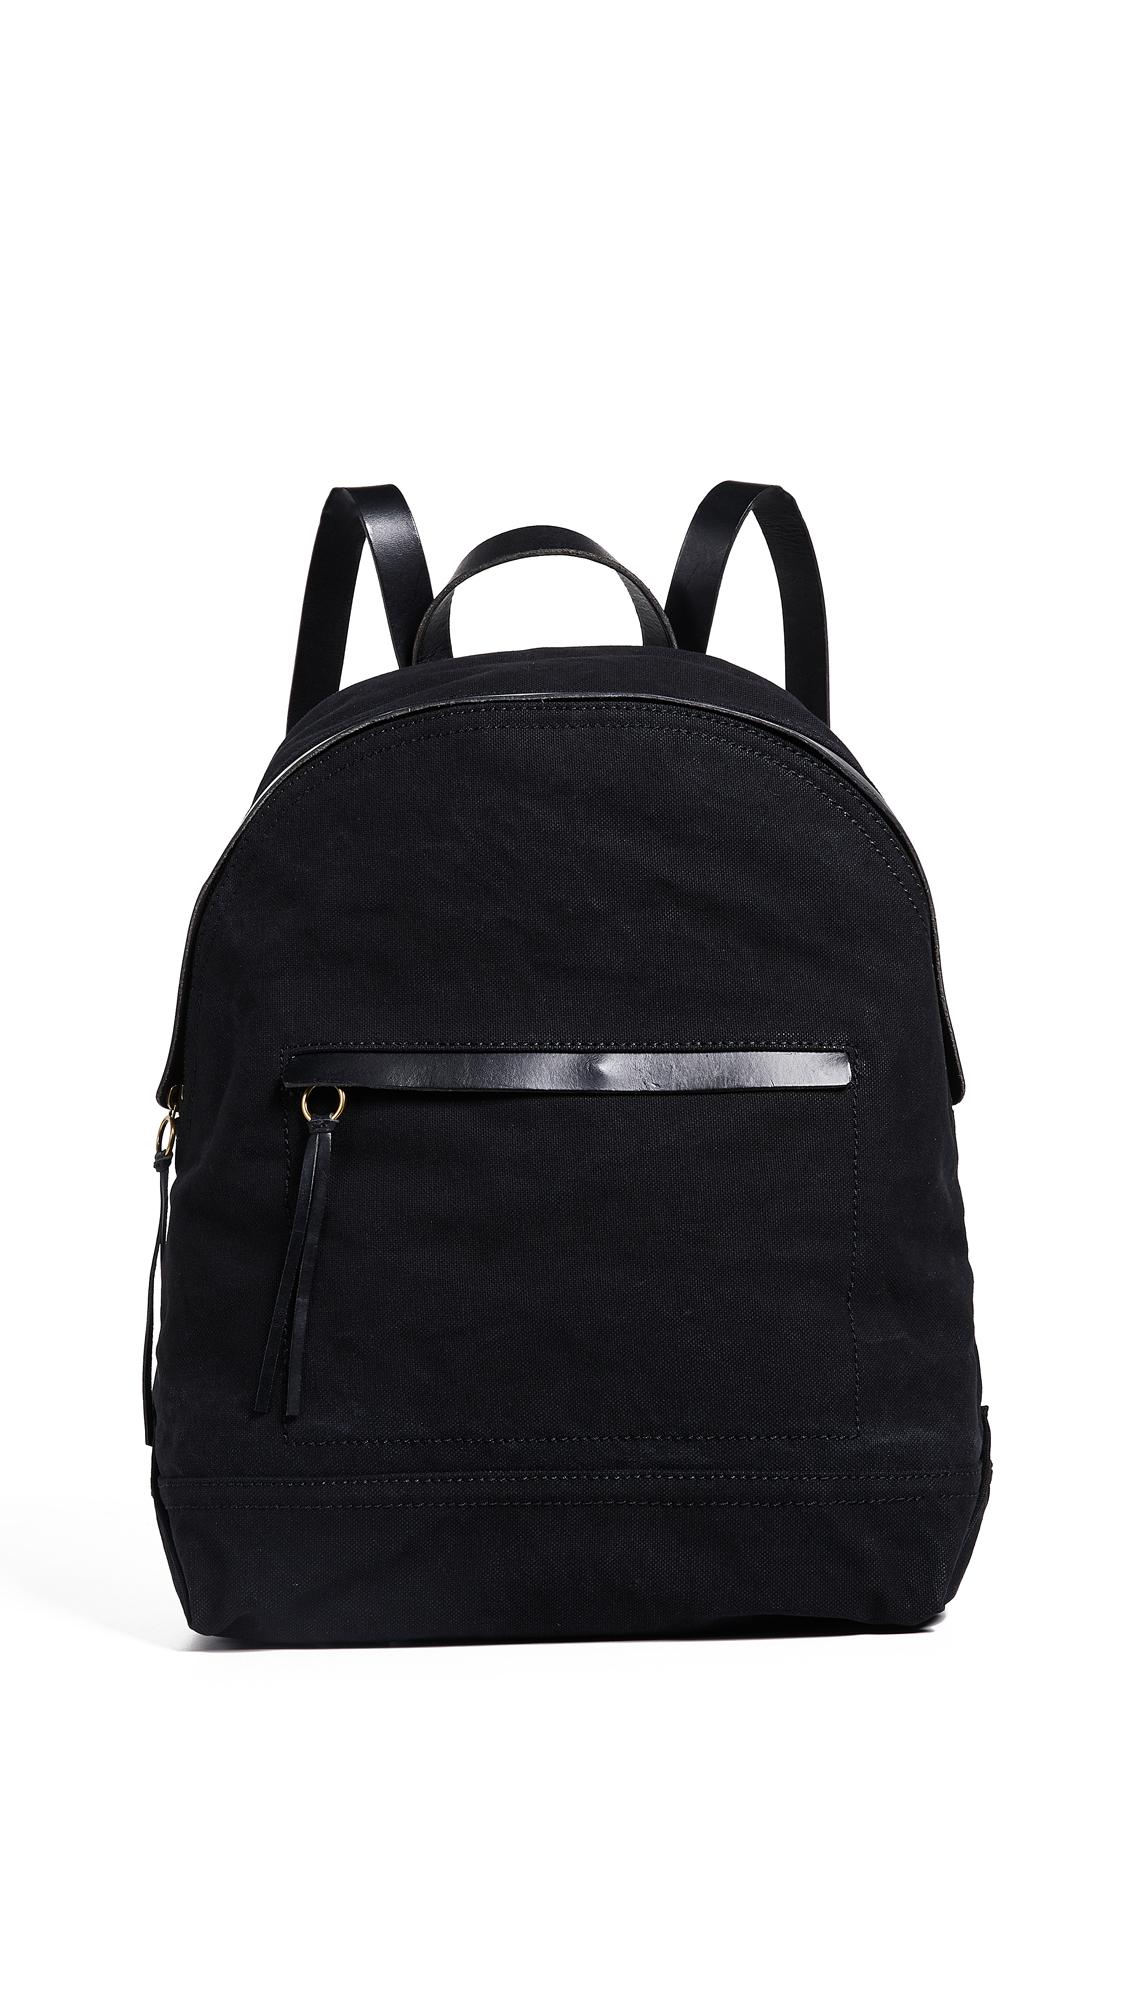 Madewell Classic Canvas Backpack - True Black